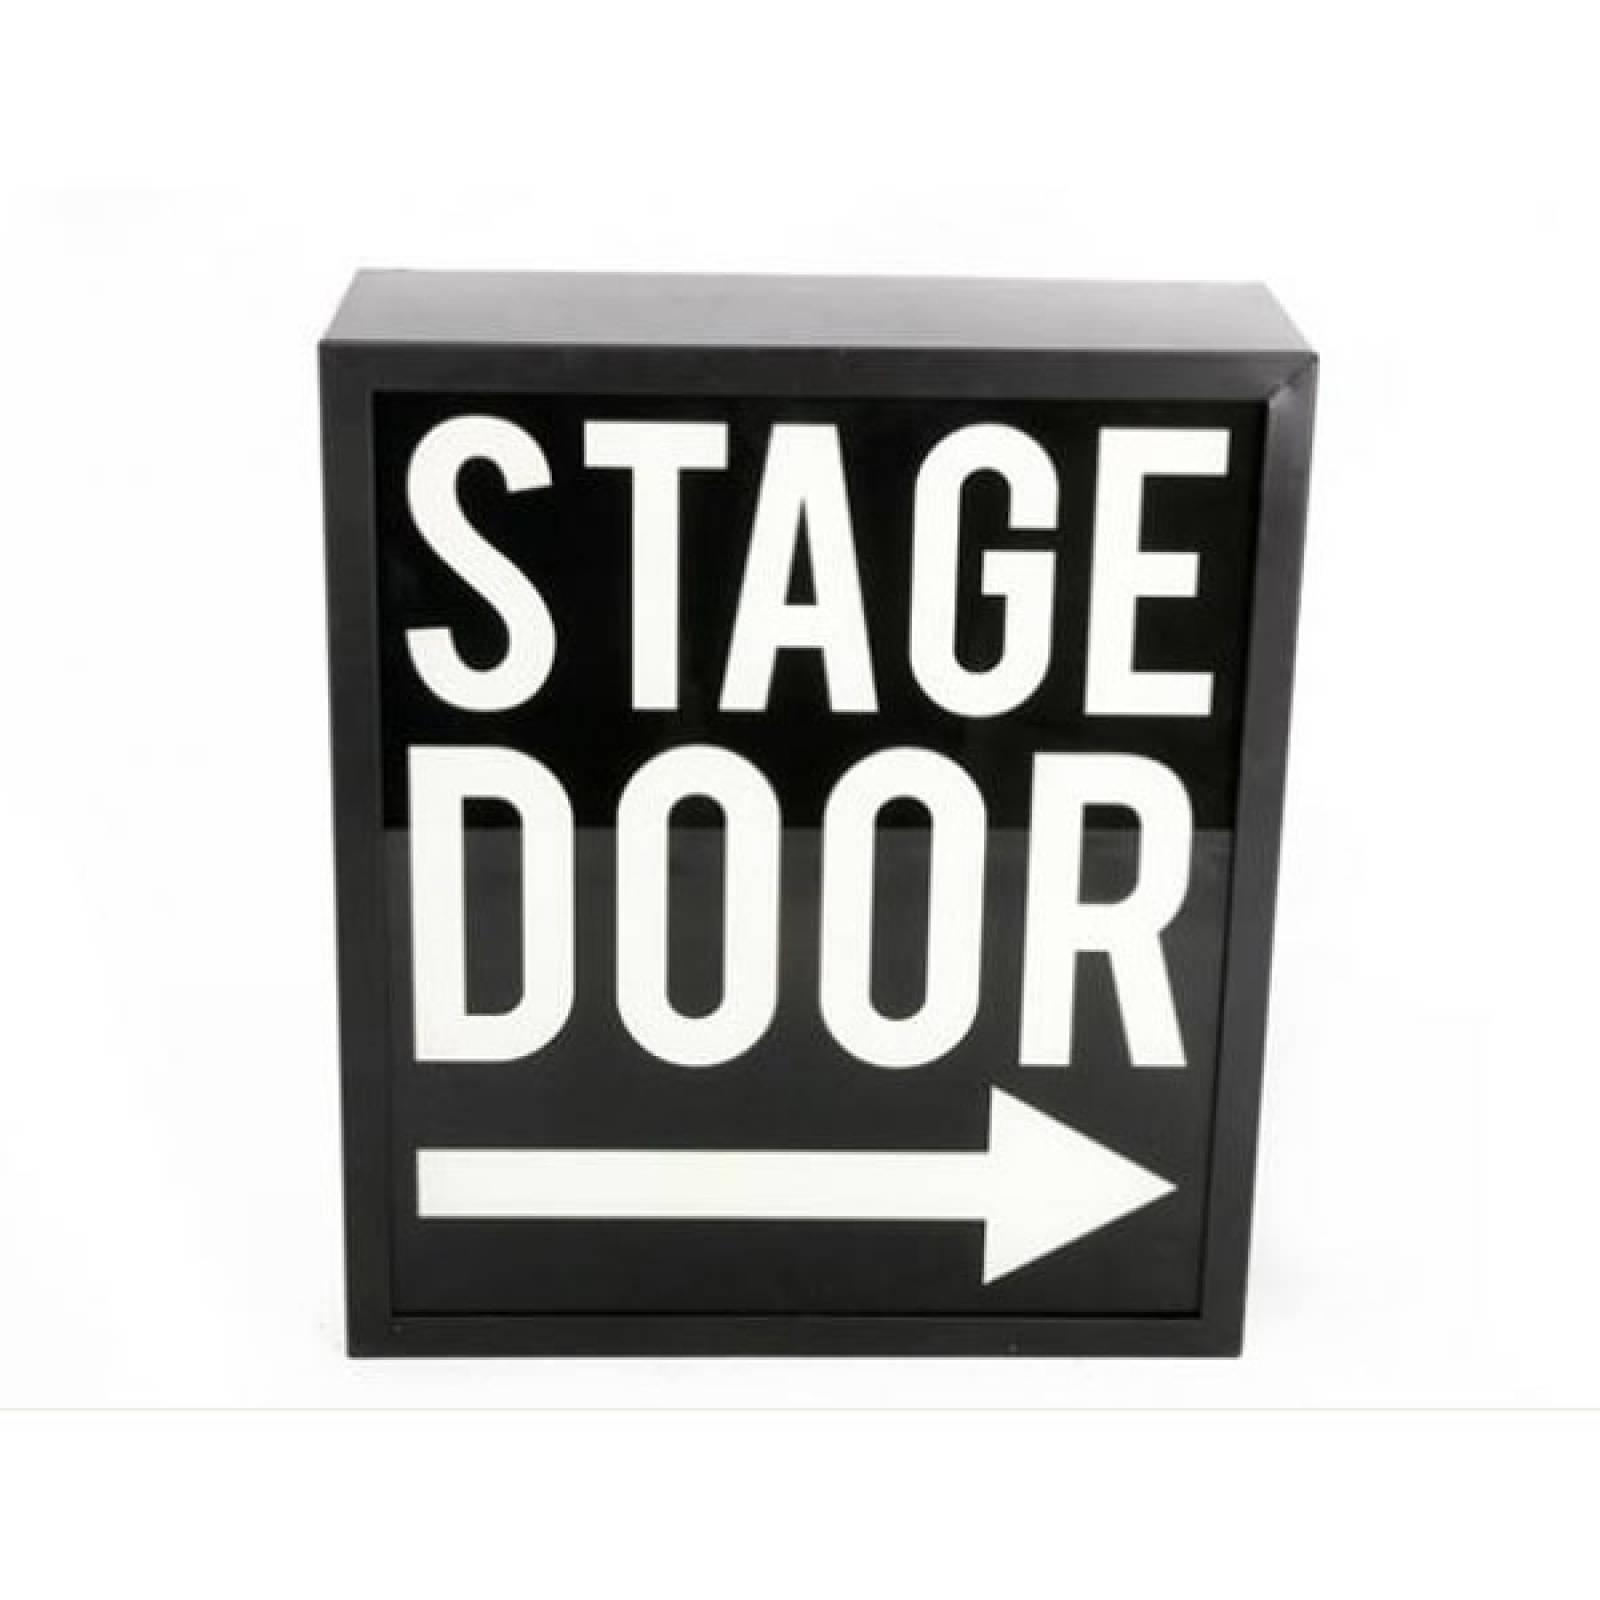 Stage Door Illuminated Sign Wall Mount Box Sign.